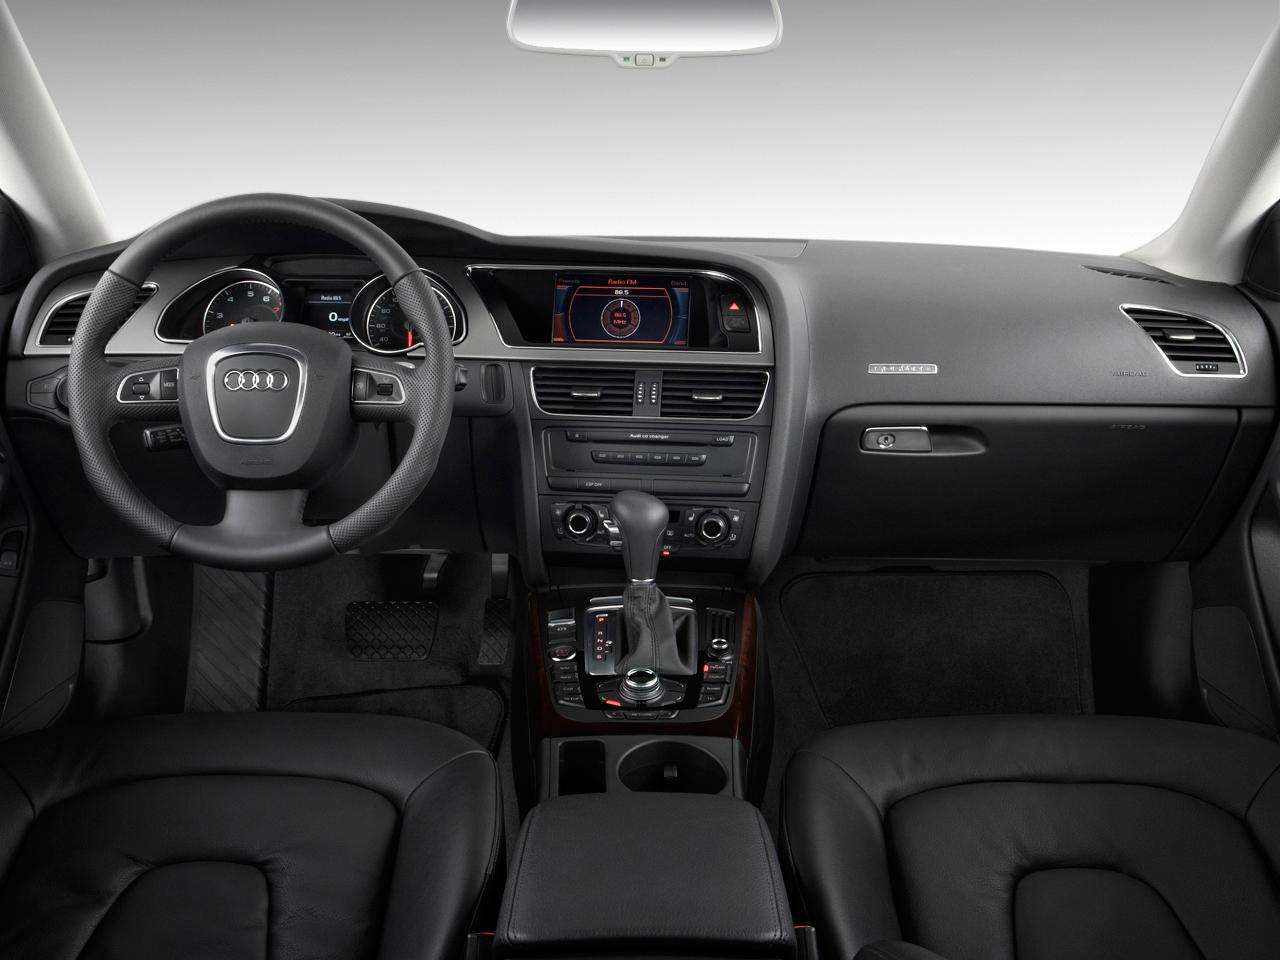 2010 Audi A5 Cabriolet Tiptronic Audi Luxury Convertible